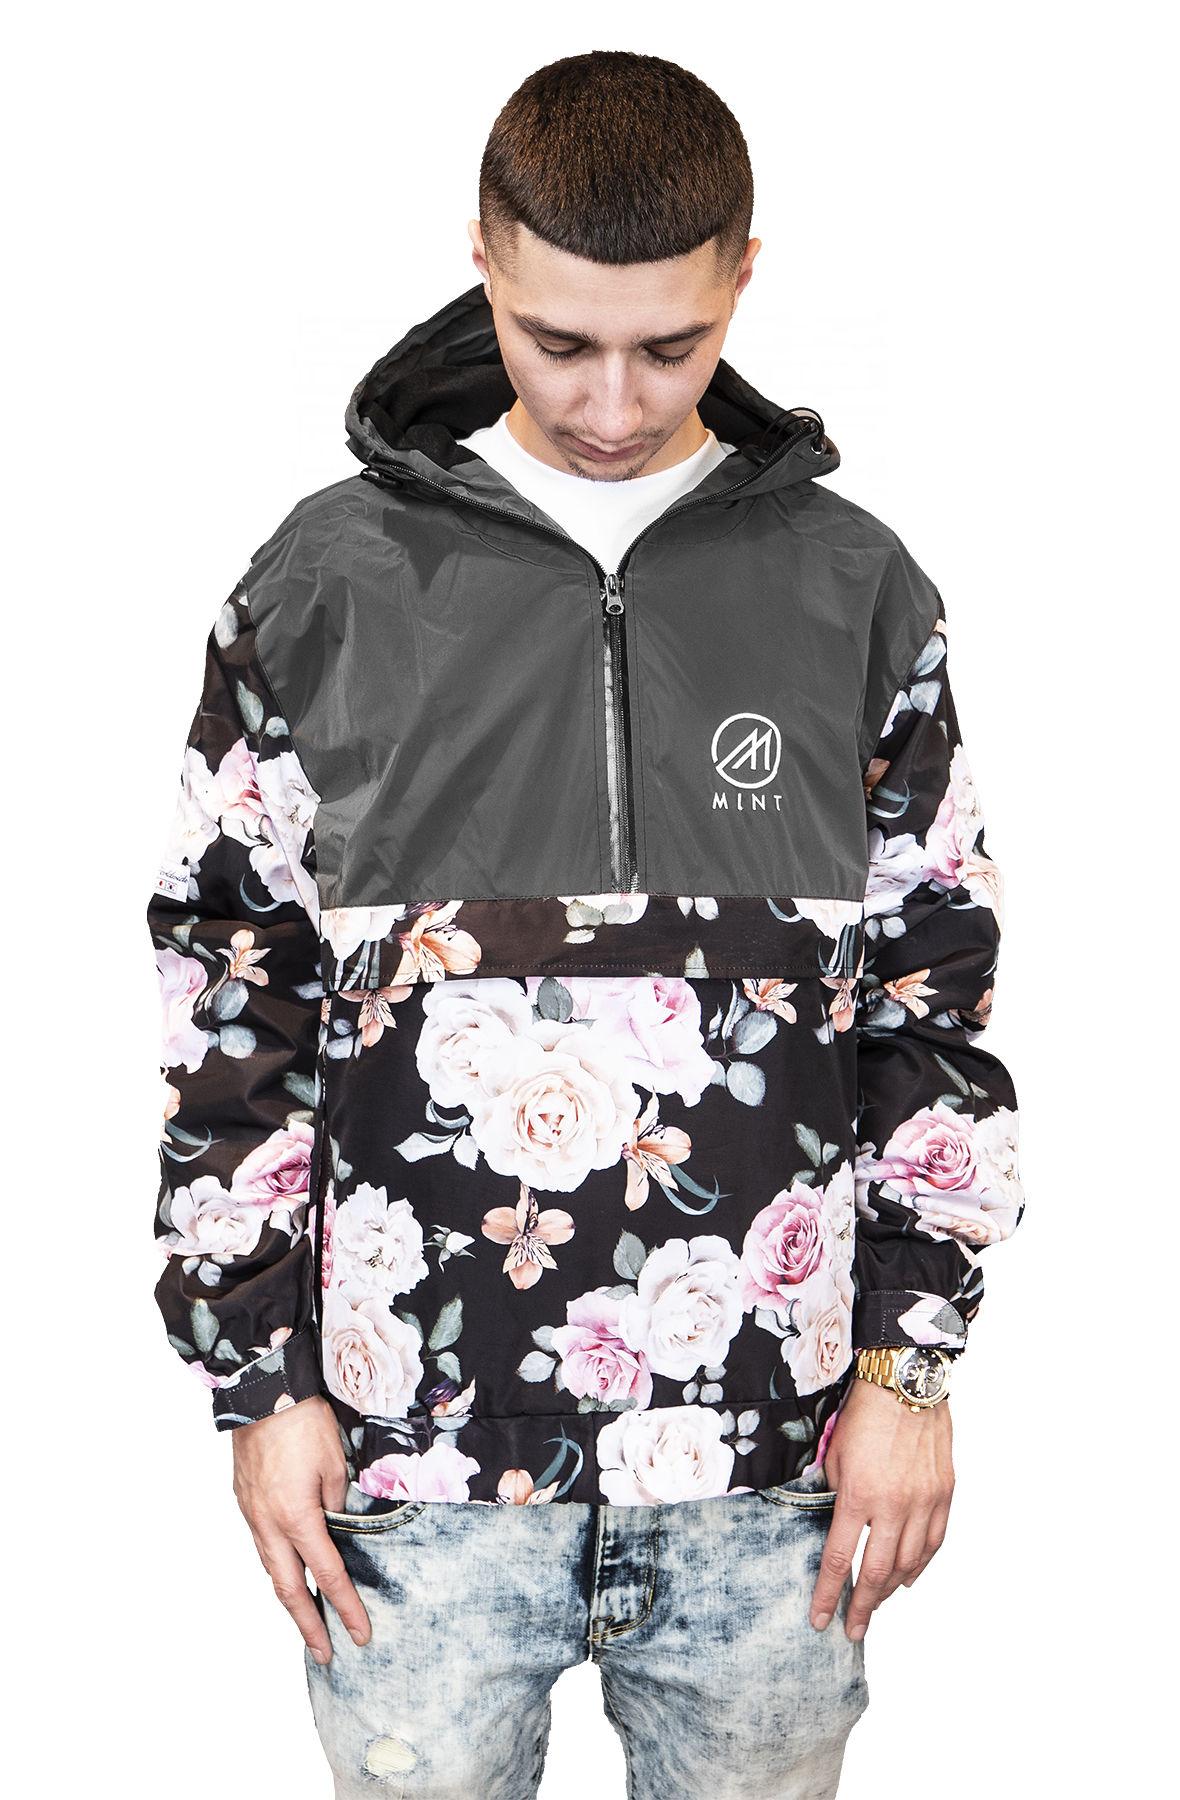 Image of Mint Windbreaker Anorak Floral Jacket Black